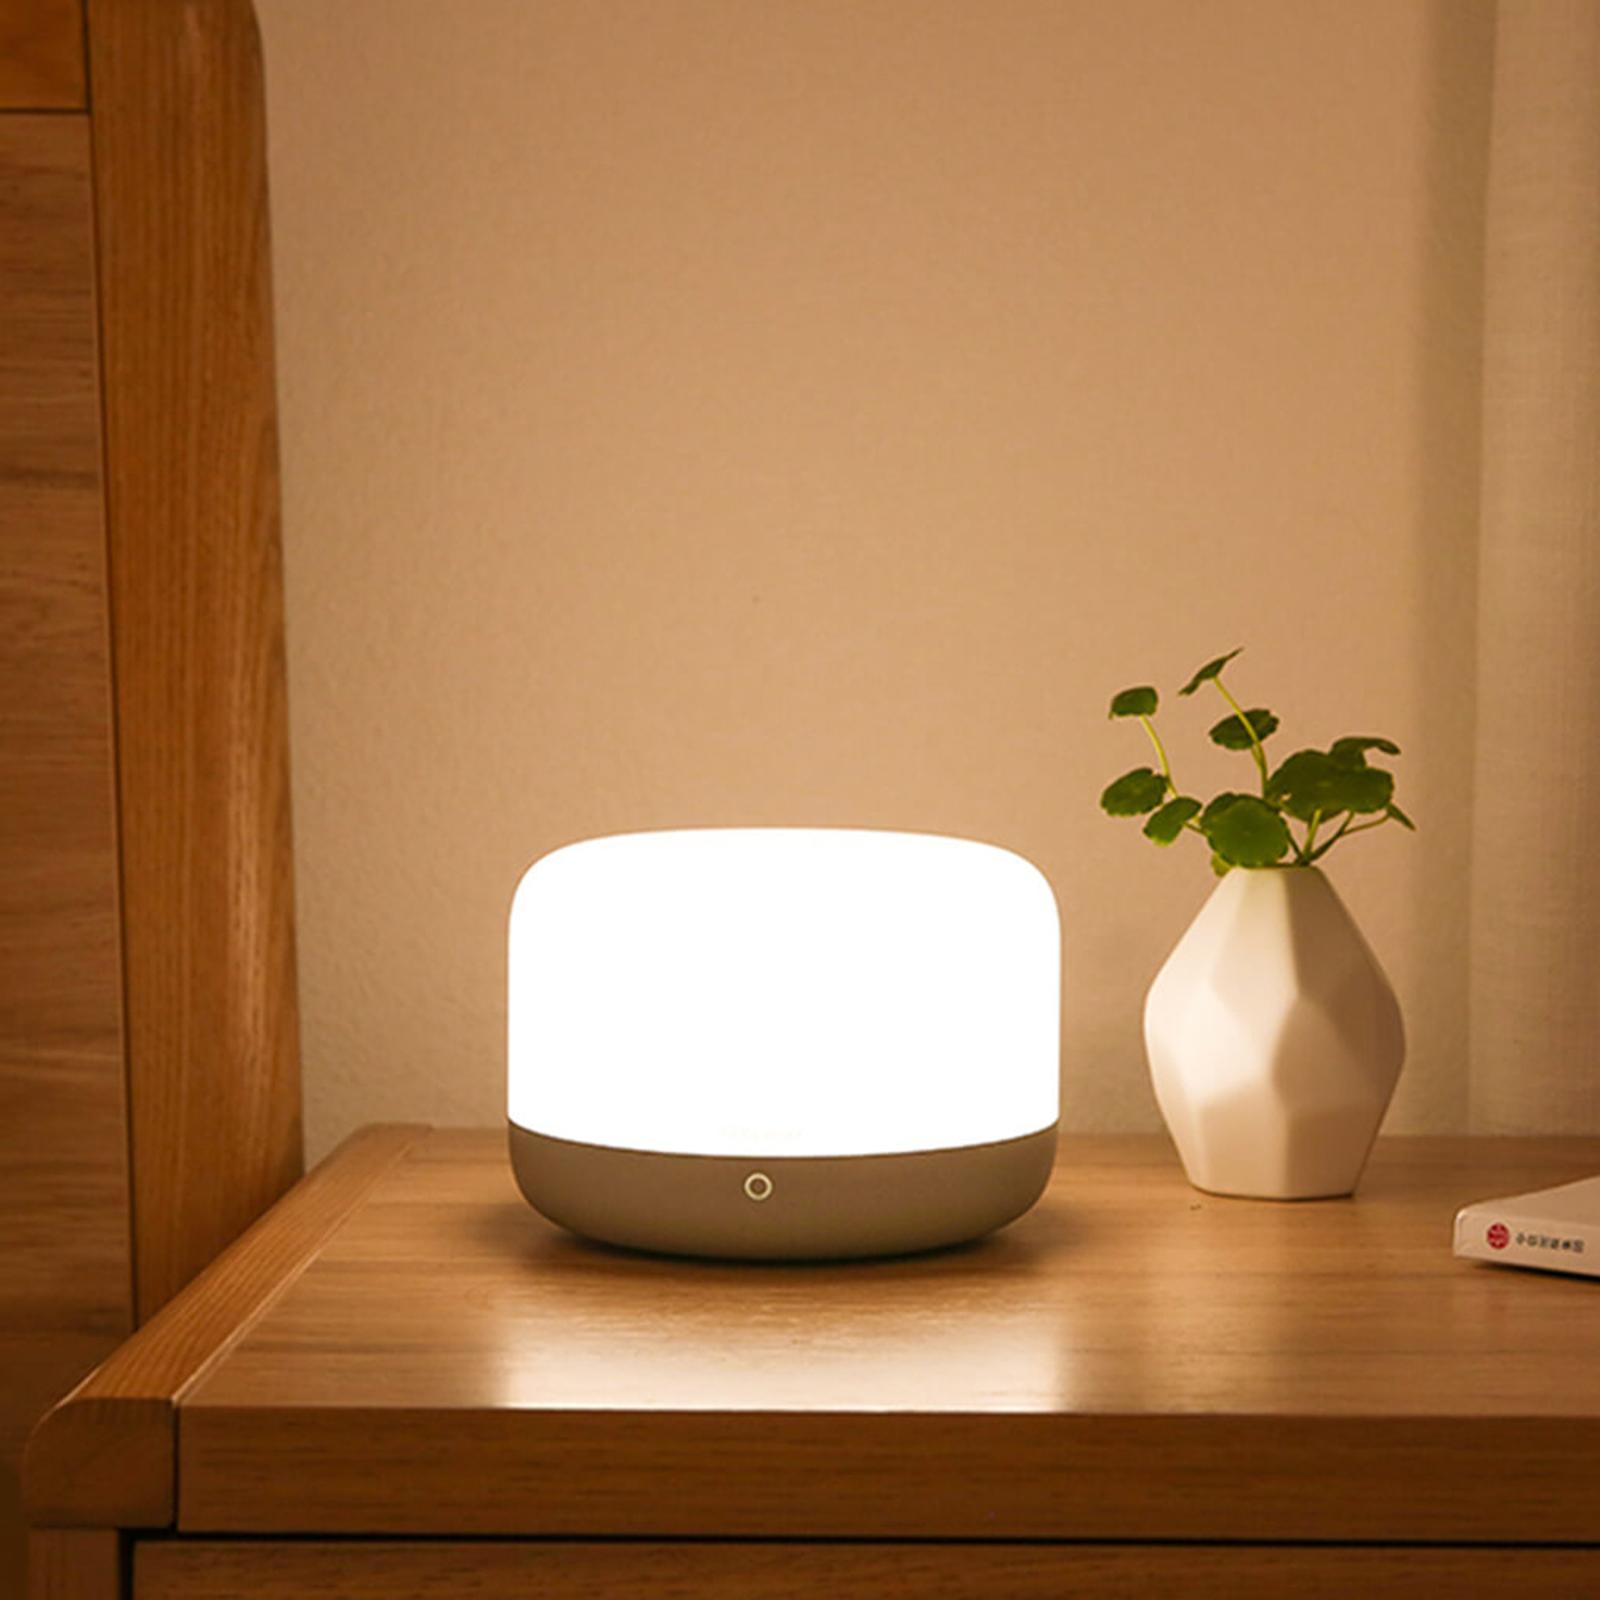 Yeelight D2 LED-nattbordslampe smart kontrollerbar